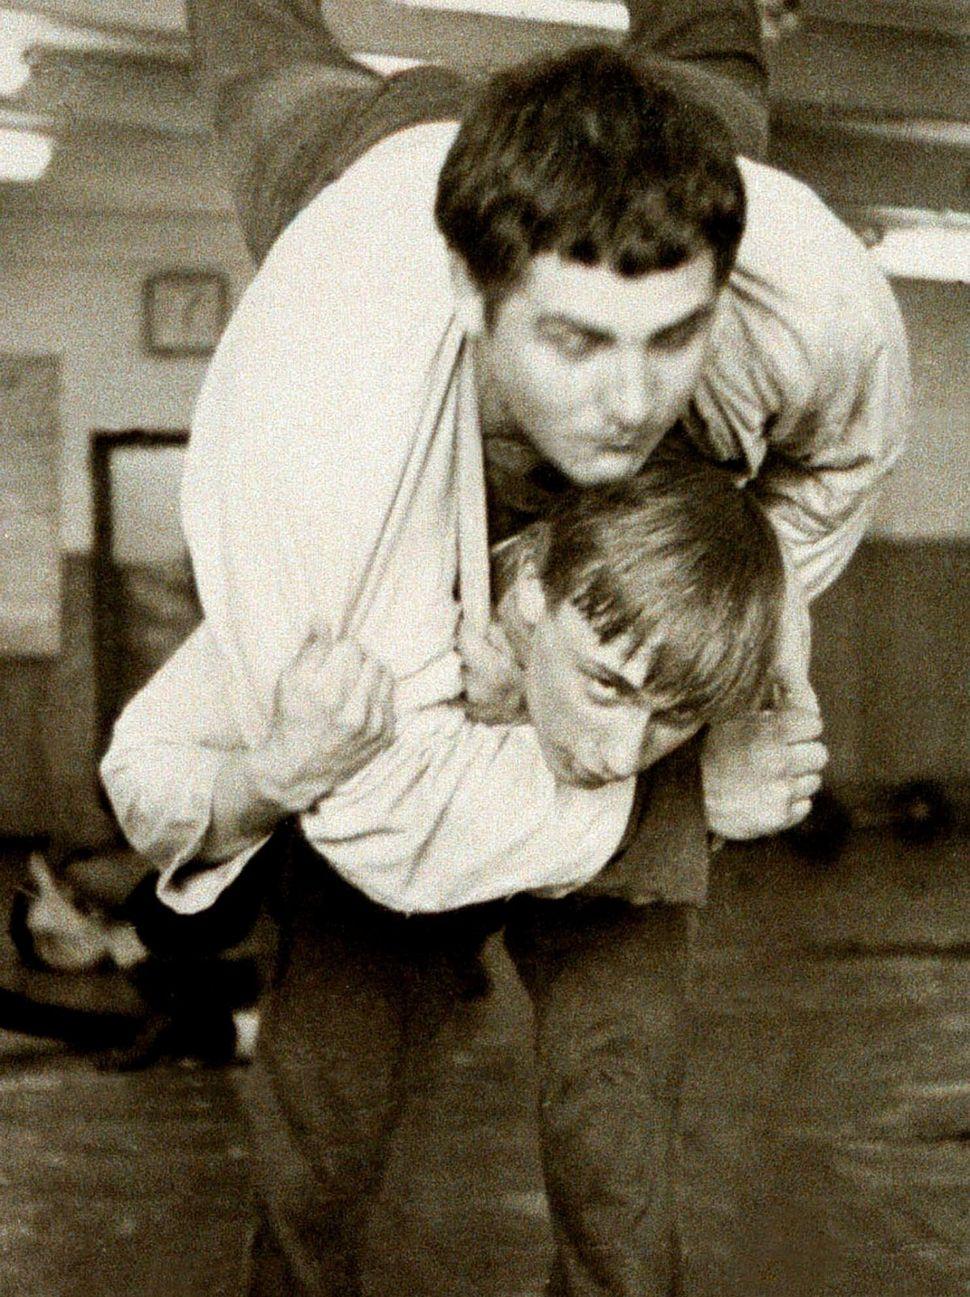 Vladimir Putin, bottom, wrestles with a classmate at the St. Petersburg Sportschool in 1971.